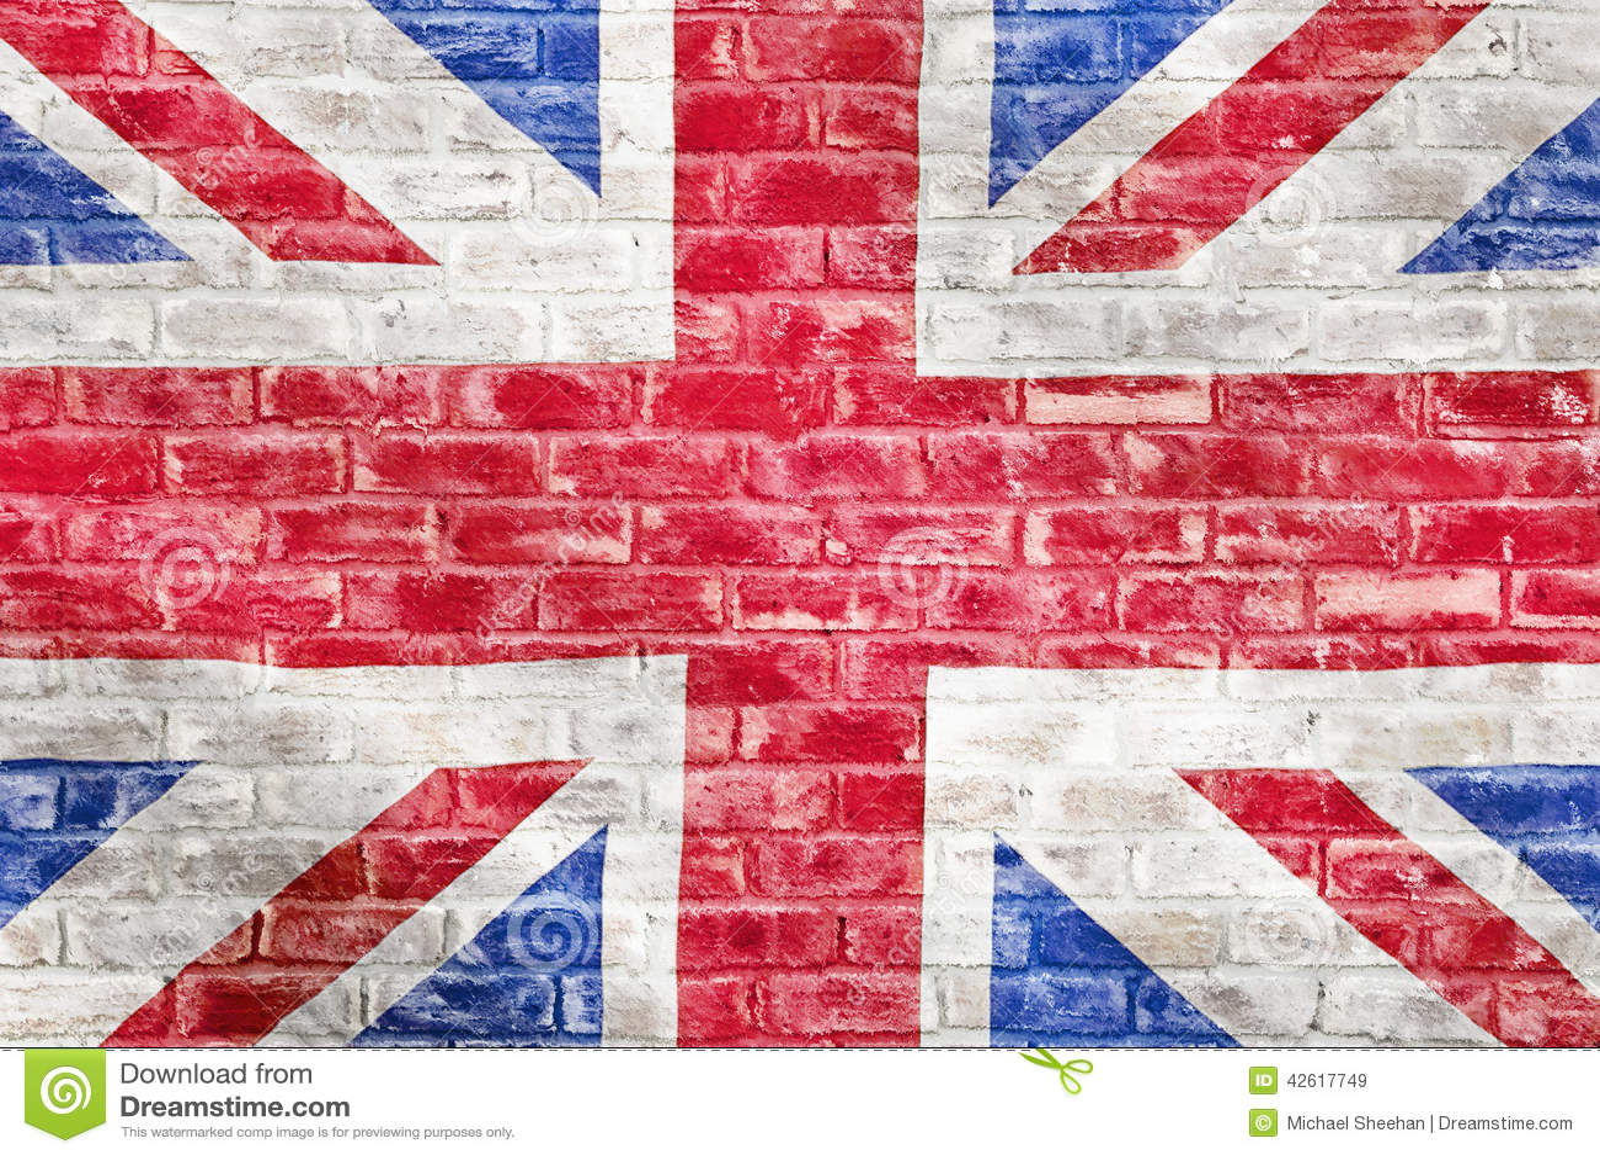 Vintage British Flag Wallpaper British flag on a brick wall